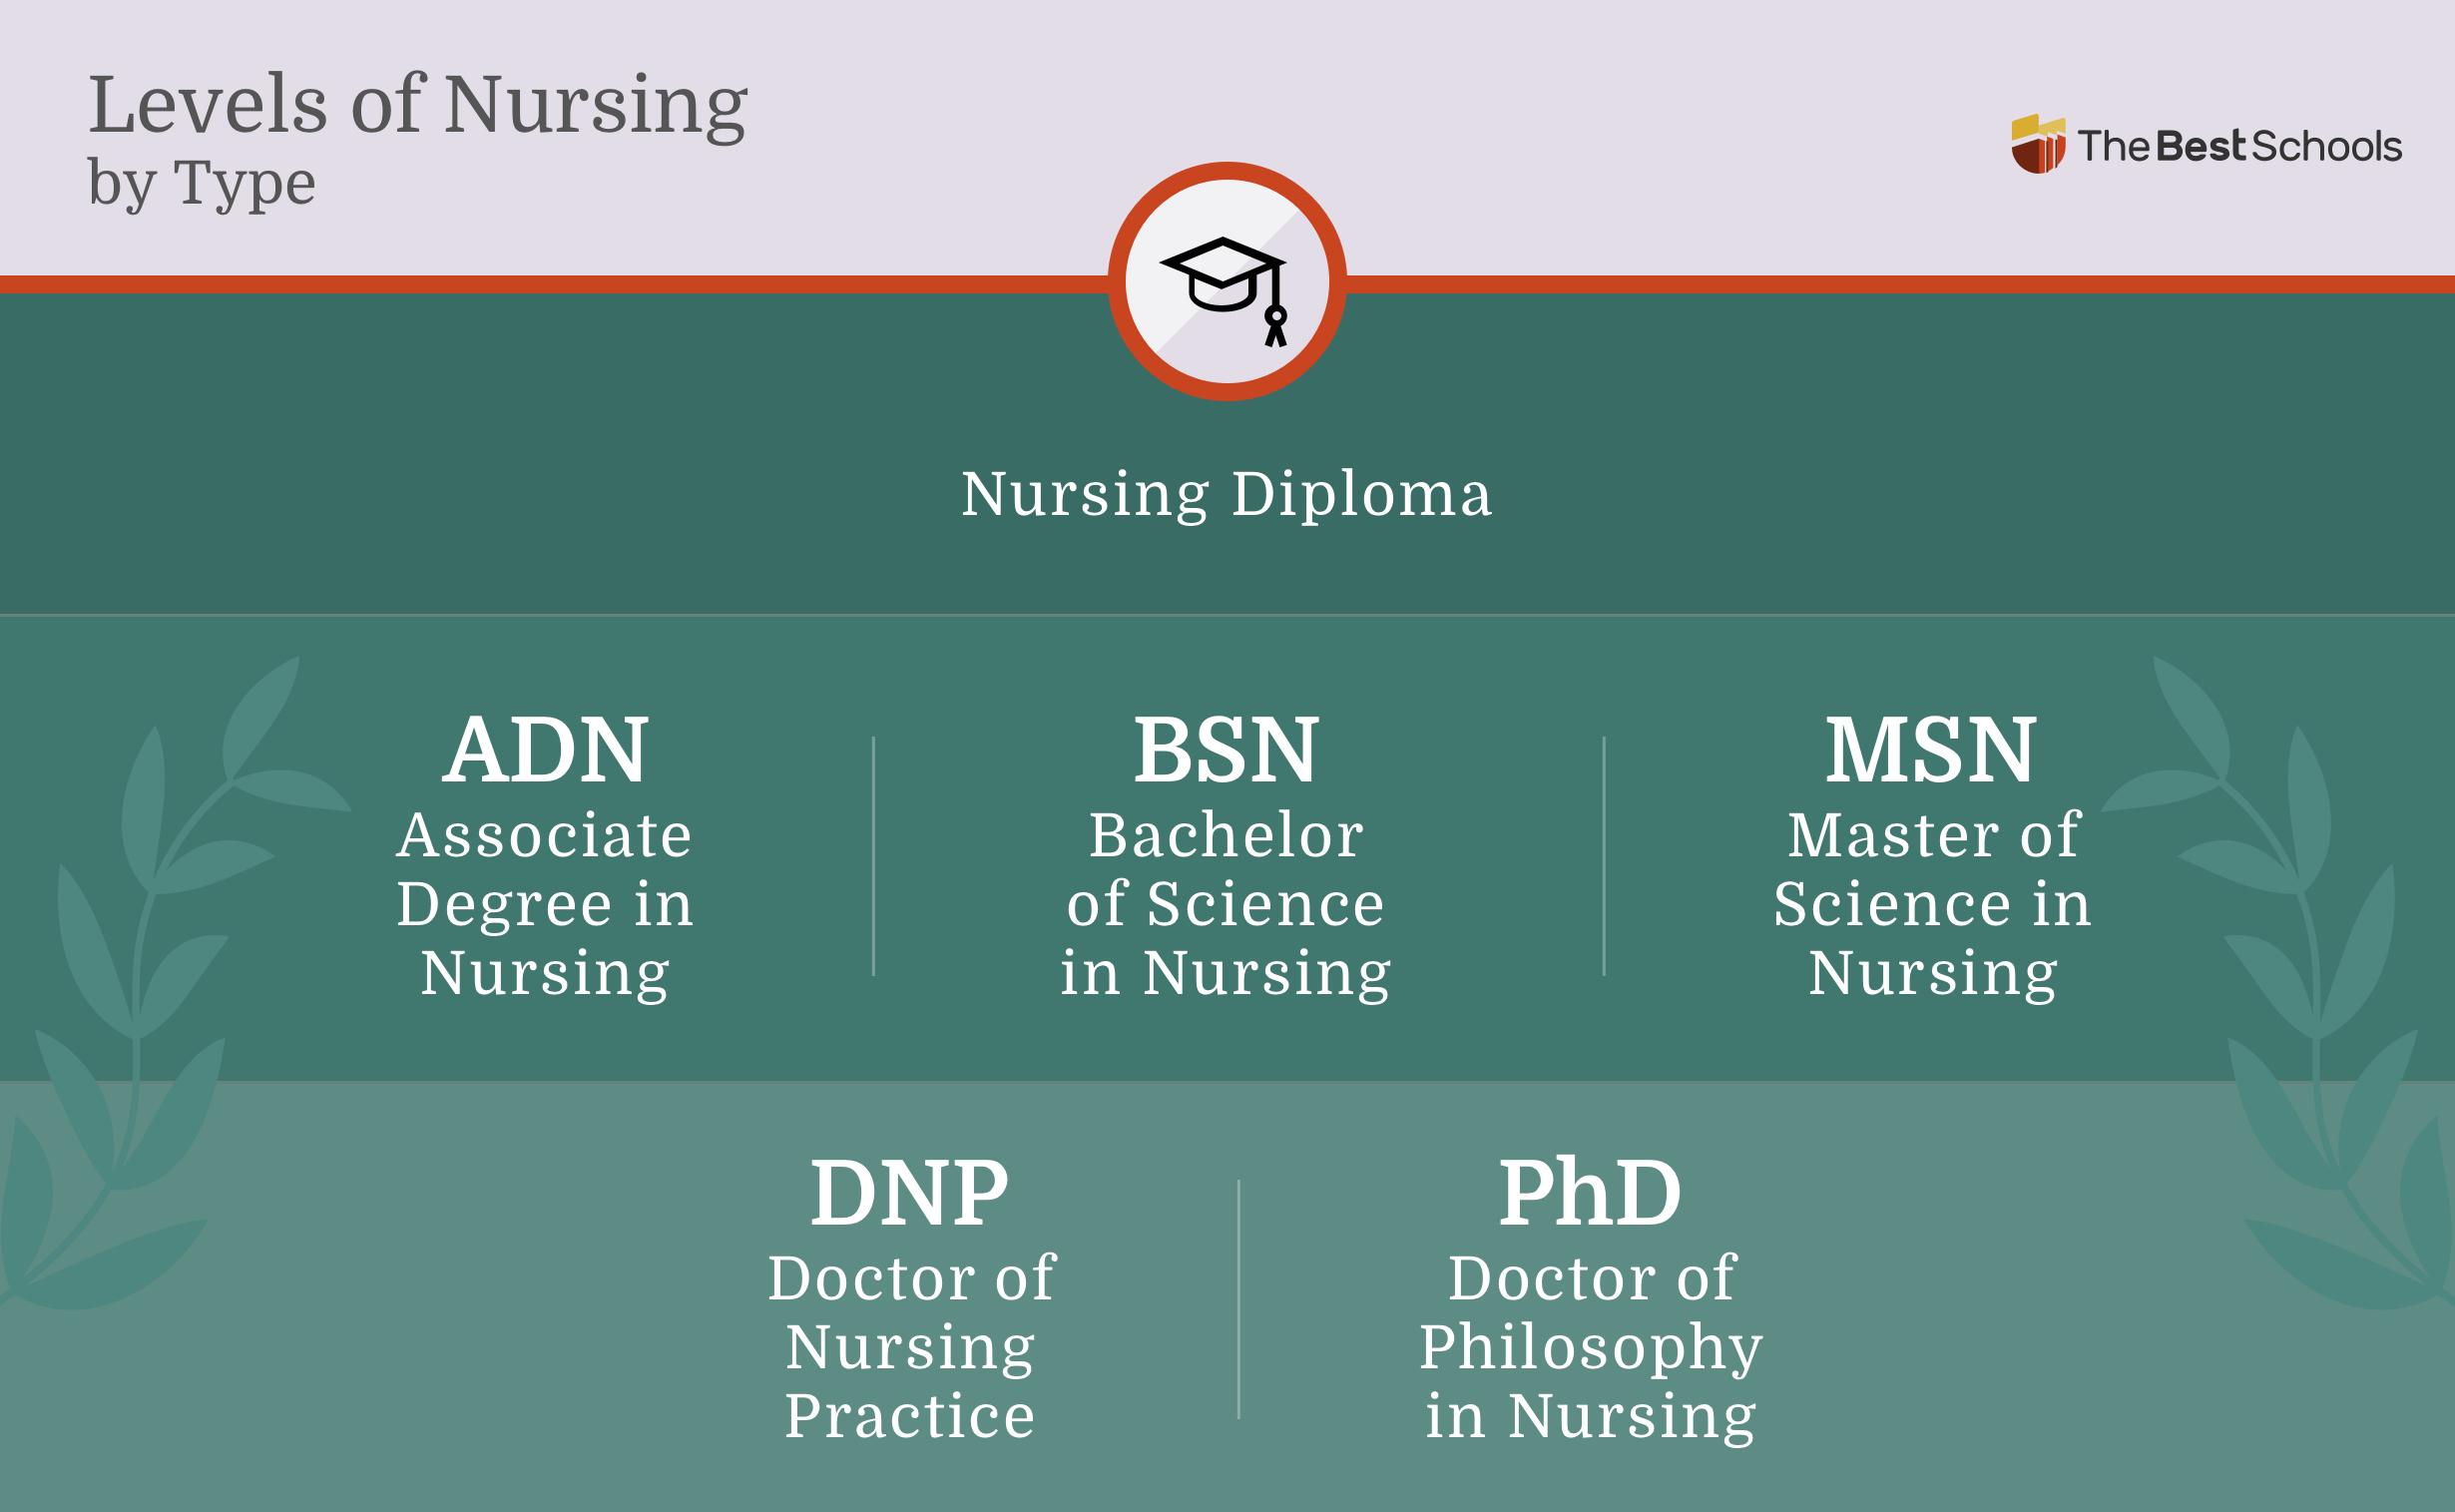 Image titled: Levels of Nursing by Type. Nursing Diploma: Associate Degree in Nursing (ADN), Bachelor of Science in Nursing (BSN), Master of Science in Nursing (MSN), Doctor of Nursing Practice (DNP), Doctor of Philosophy in Nursing (PhD).